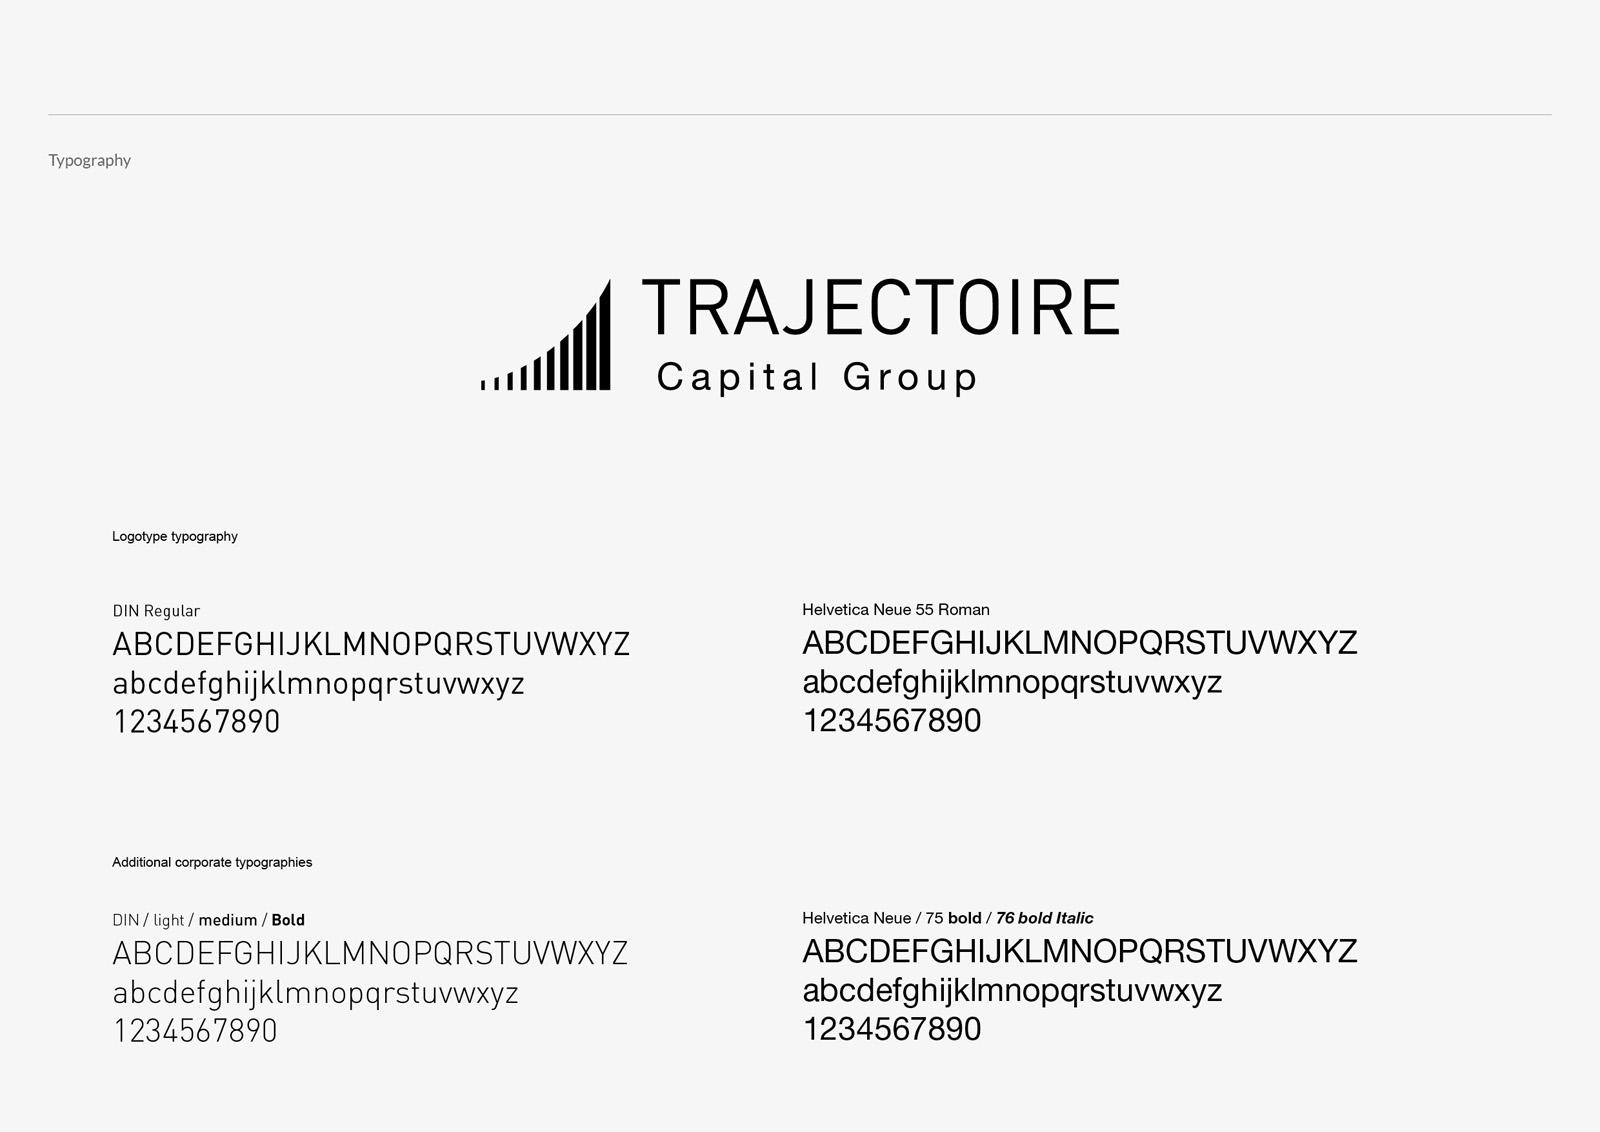 Trajectoire Capital Group | more graphic design